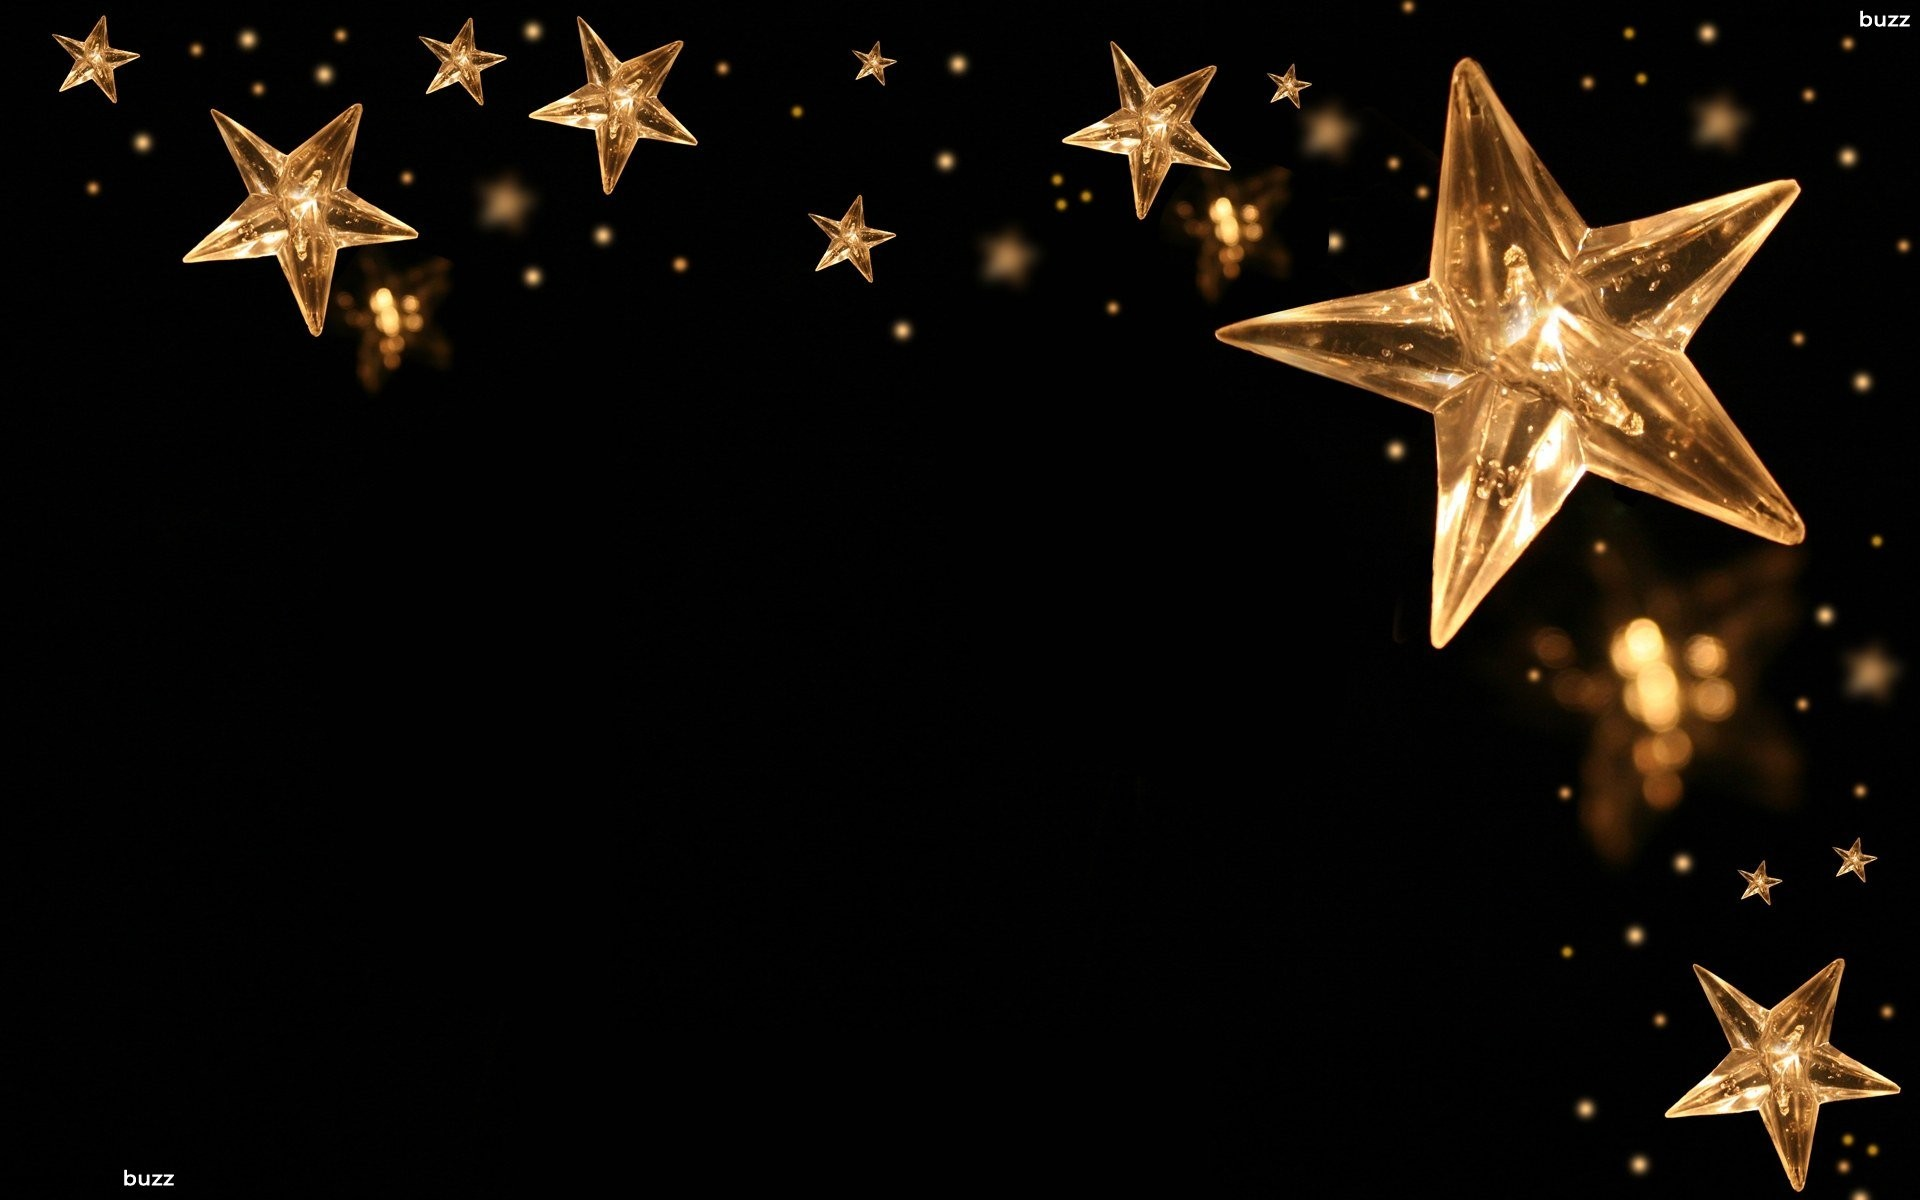 Star Wallpaper 1837 Hd Wallpapers in Space – Imagesci.com